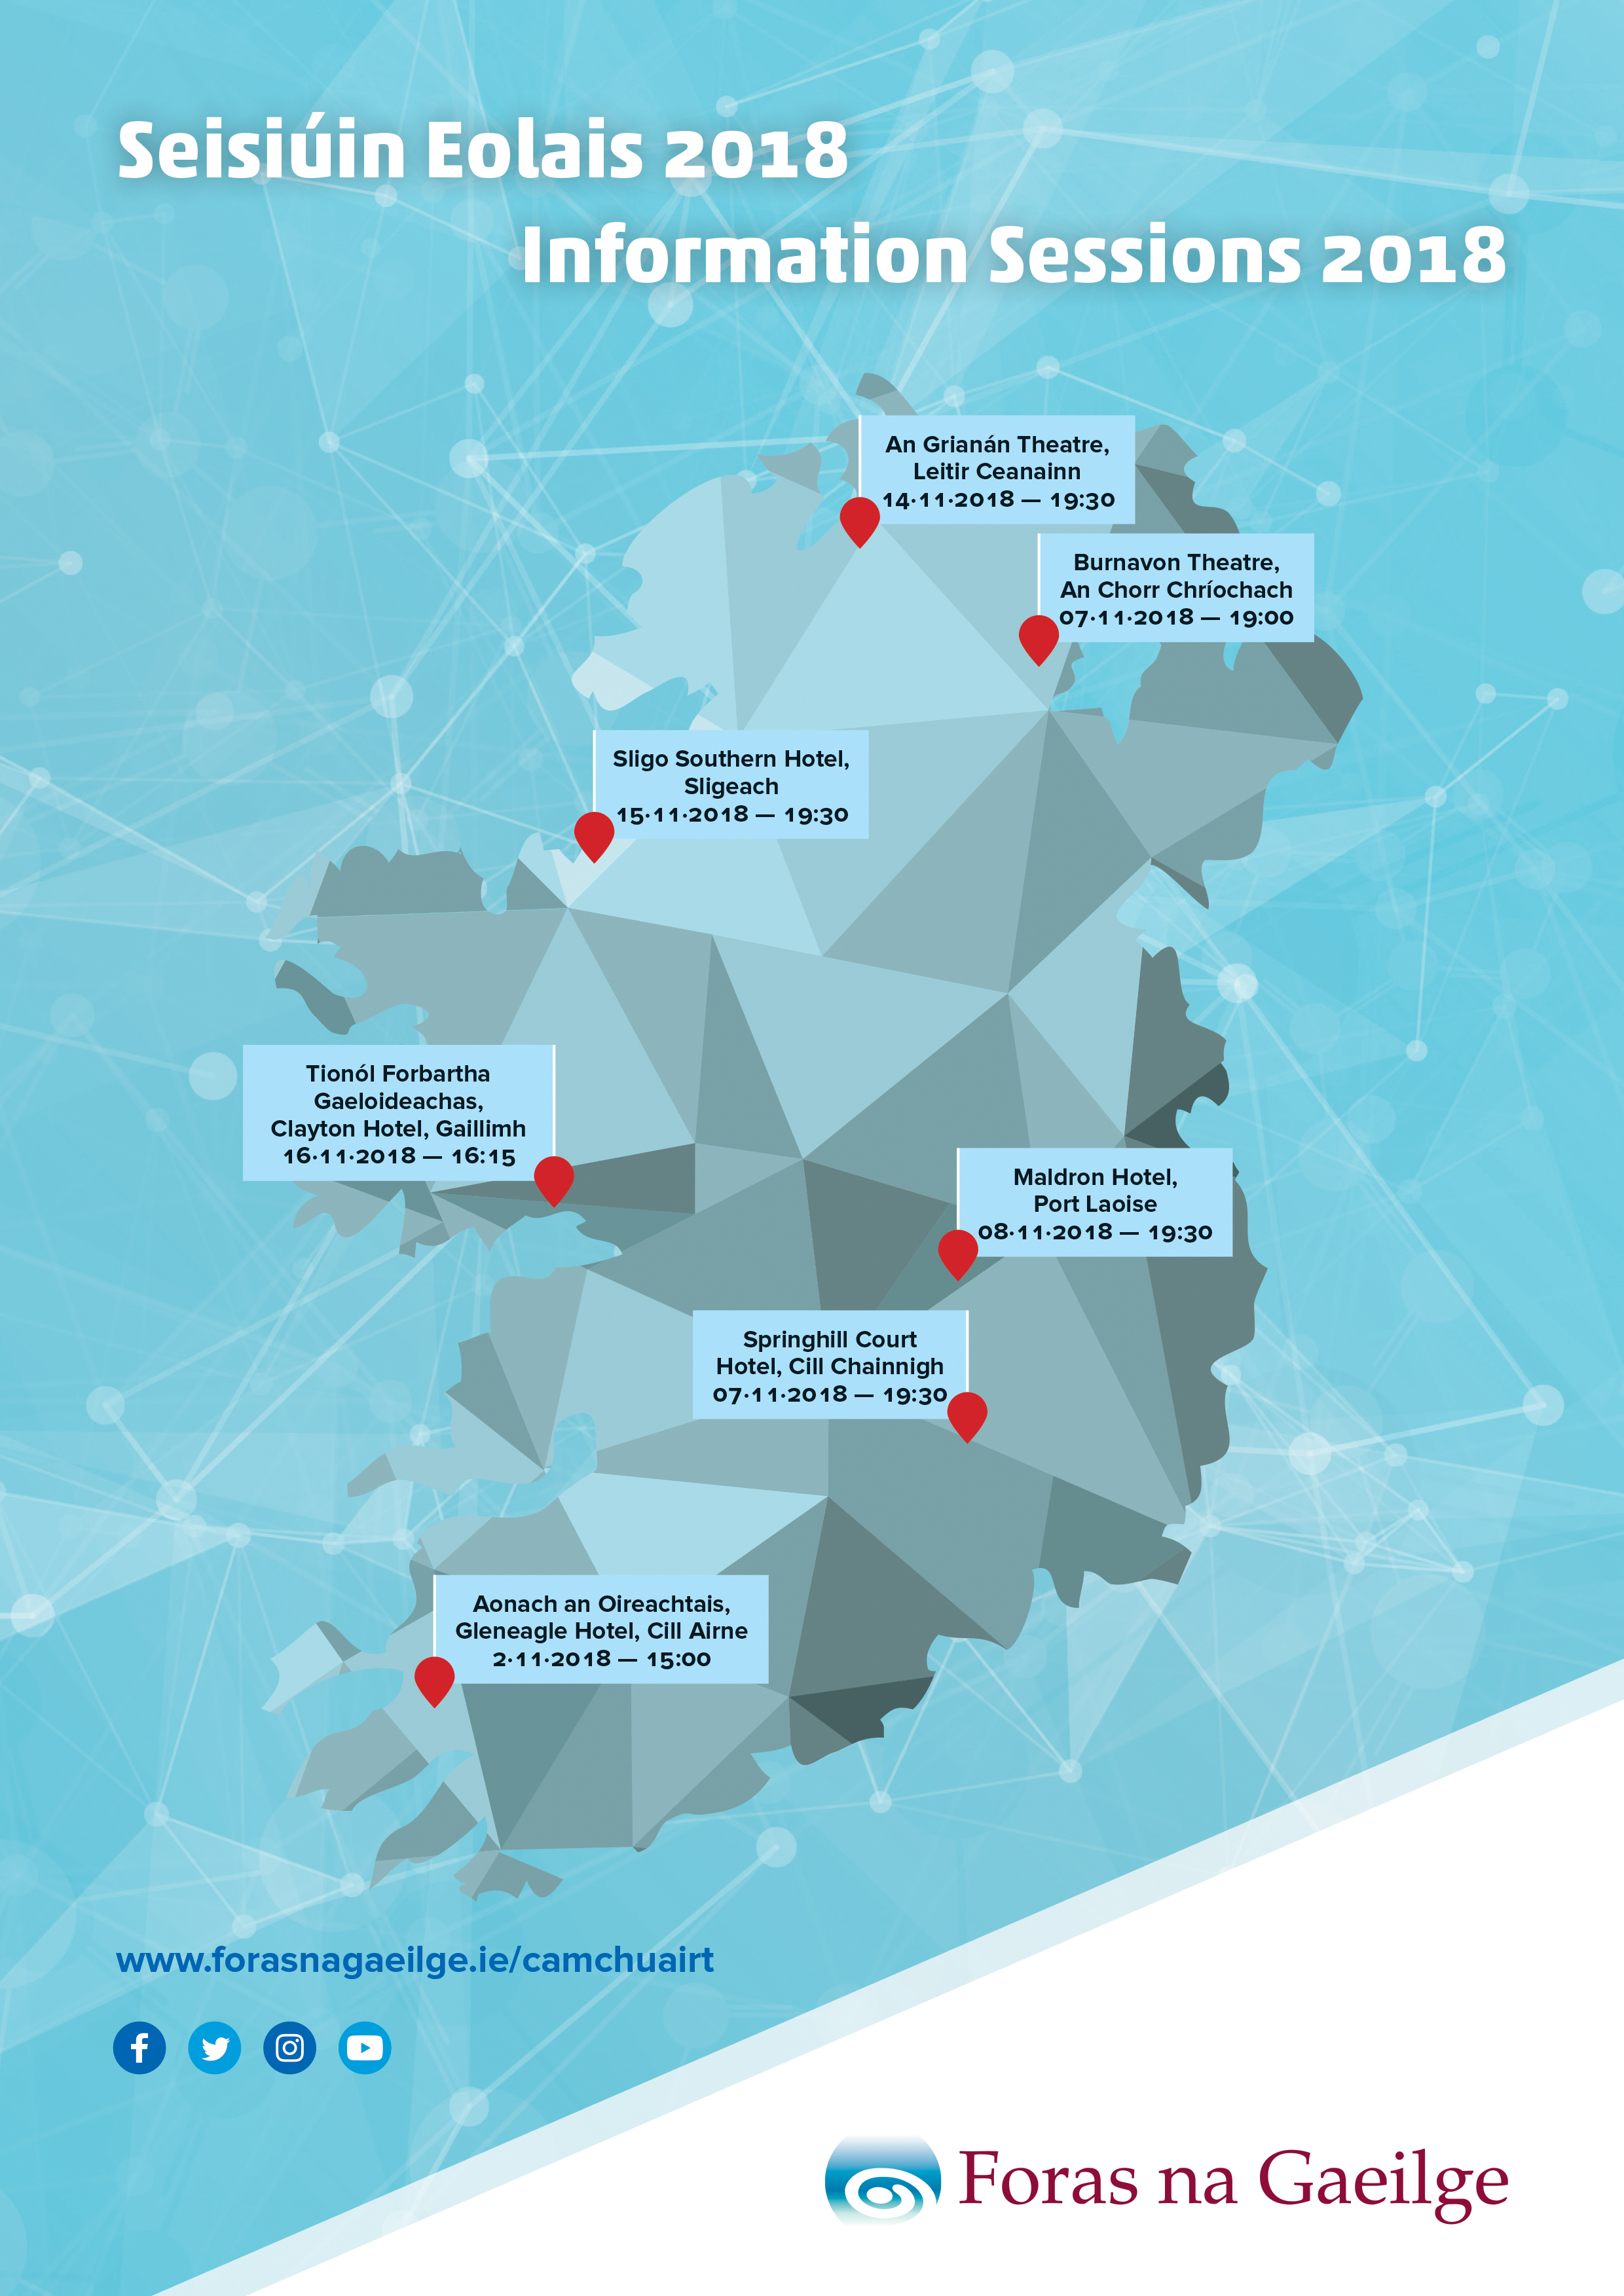 Map Of Ireland Gaeilge.Foras Na Gaeilge Announces Tour Www Forasnagaeilge Ie